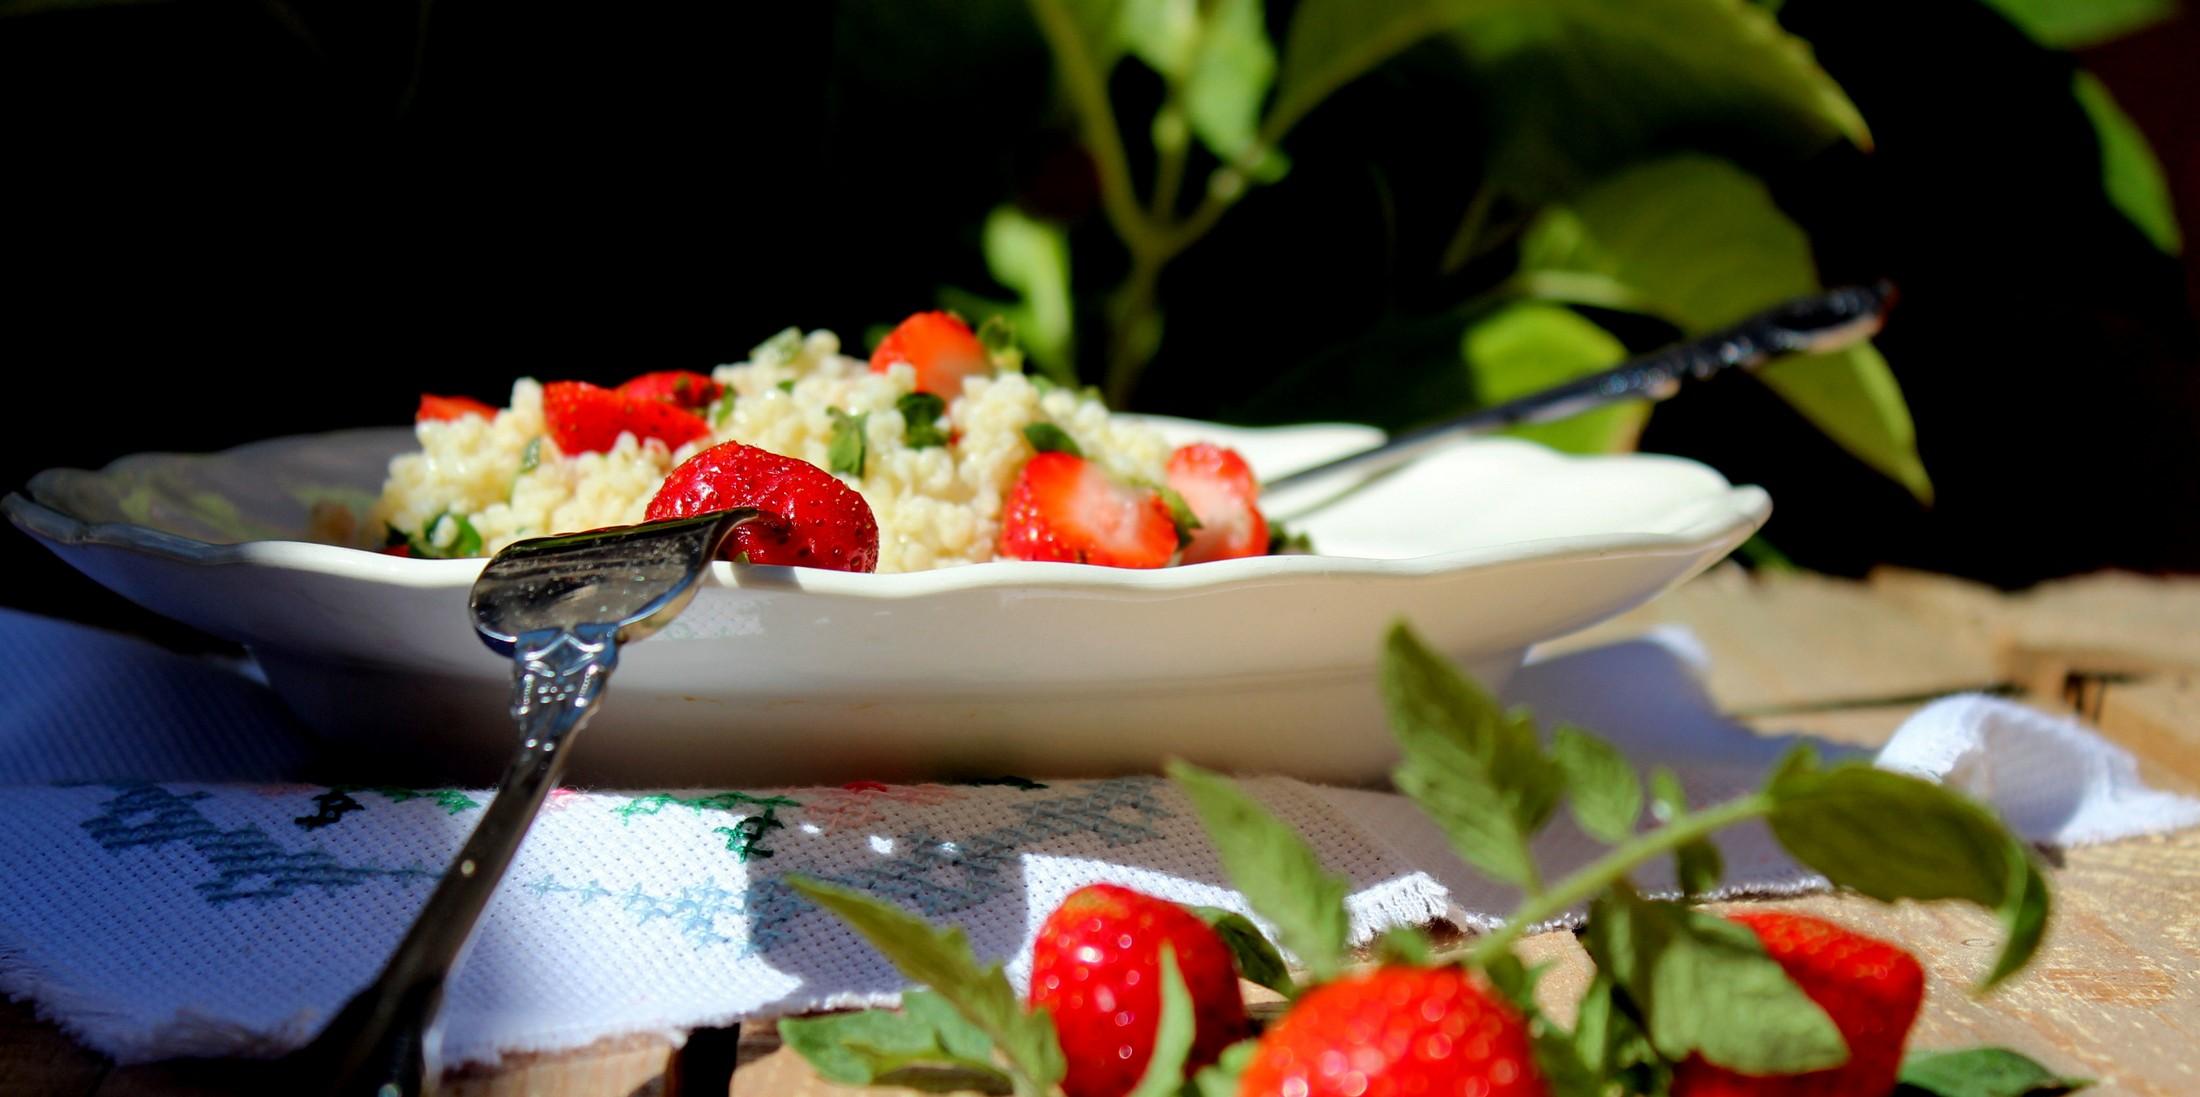 ensalada de mijo con fresas y cherrys